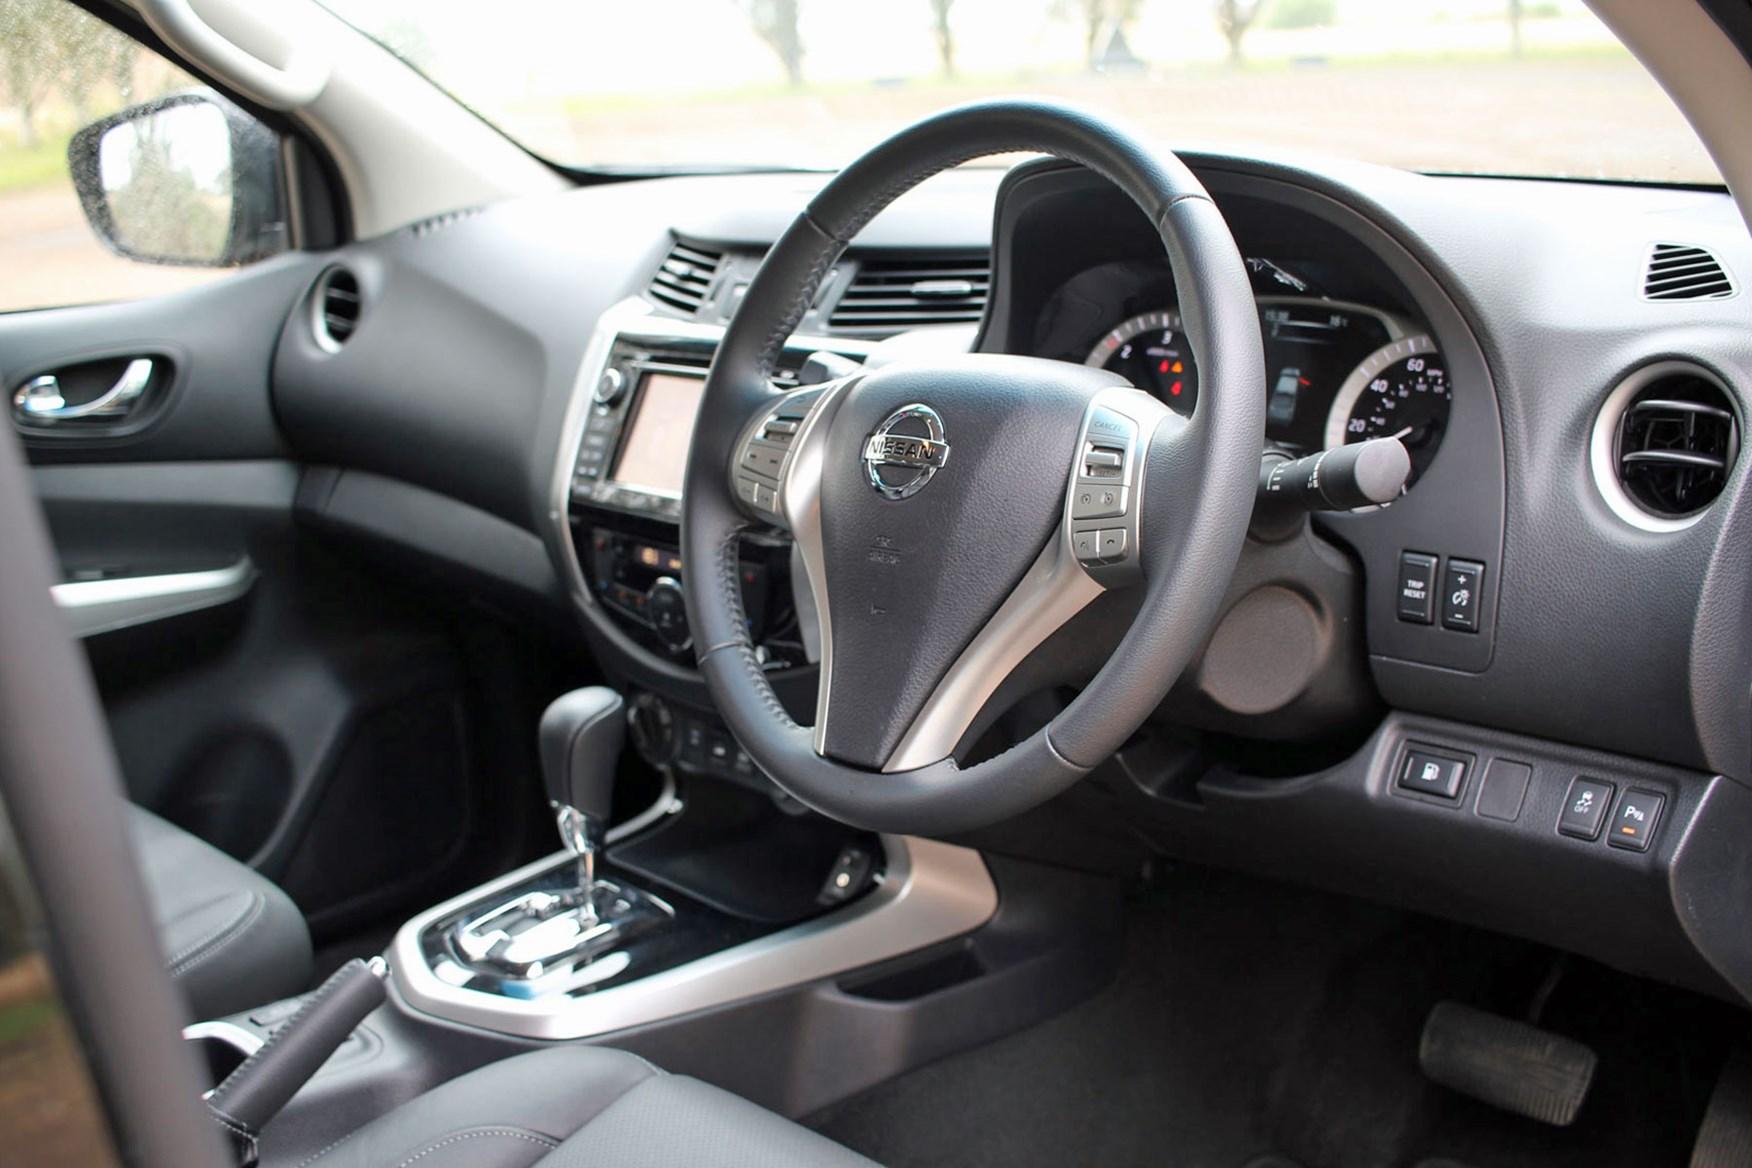 Nissan Navara Trek-1 review - cab interior, steering wheel, dashboard